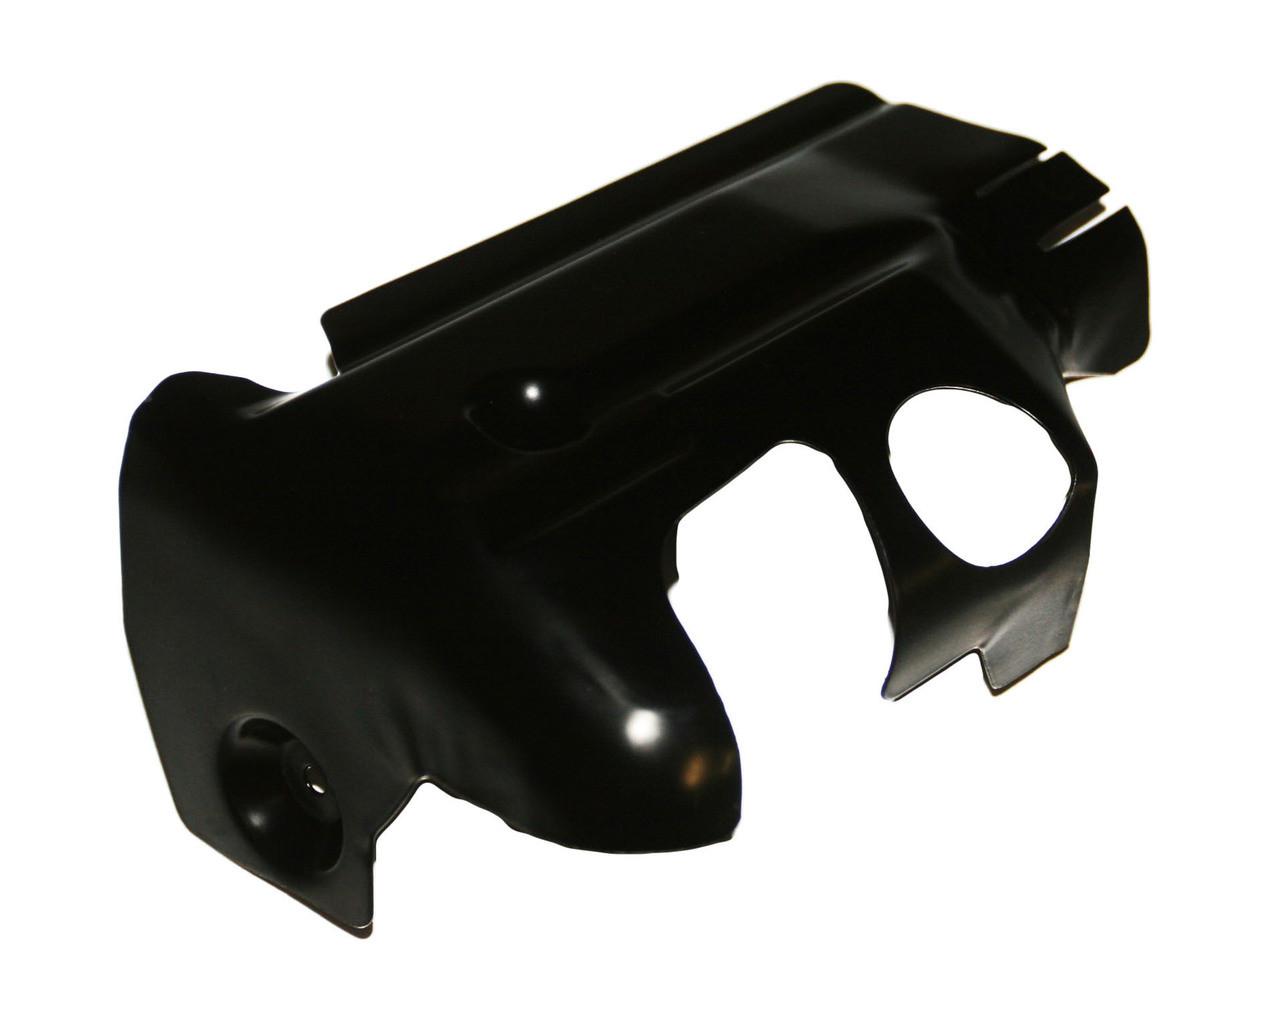 #02: P/N EBL0518: Cylinder Shield (Black)